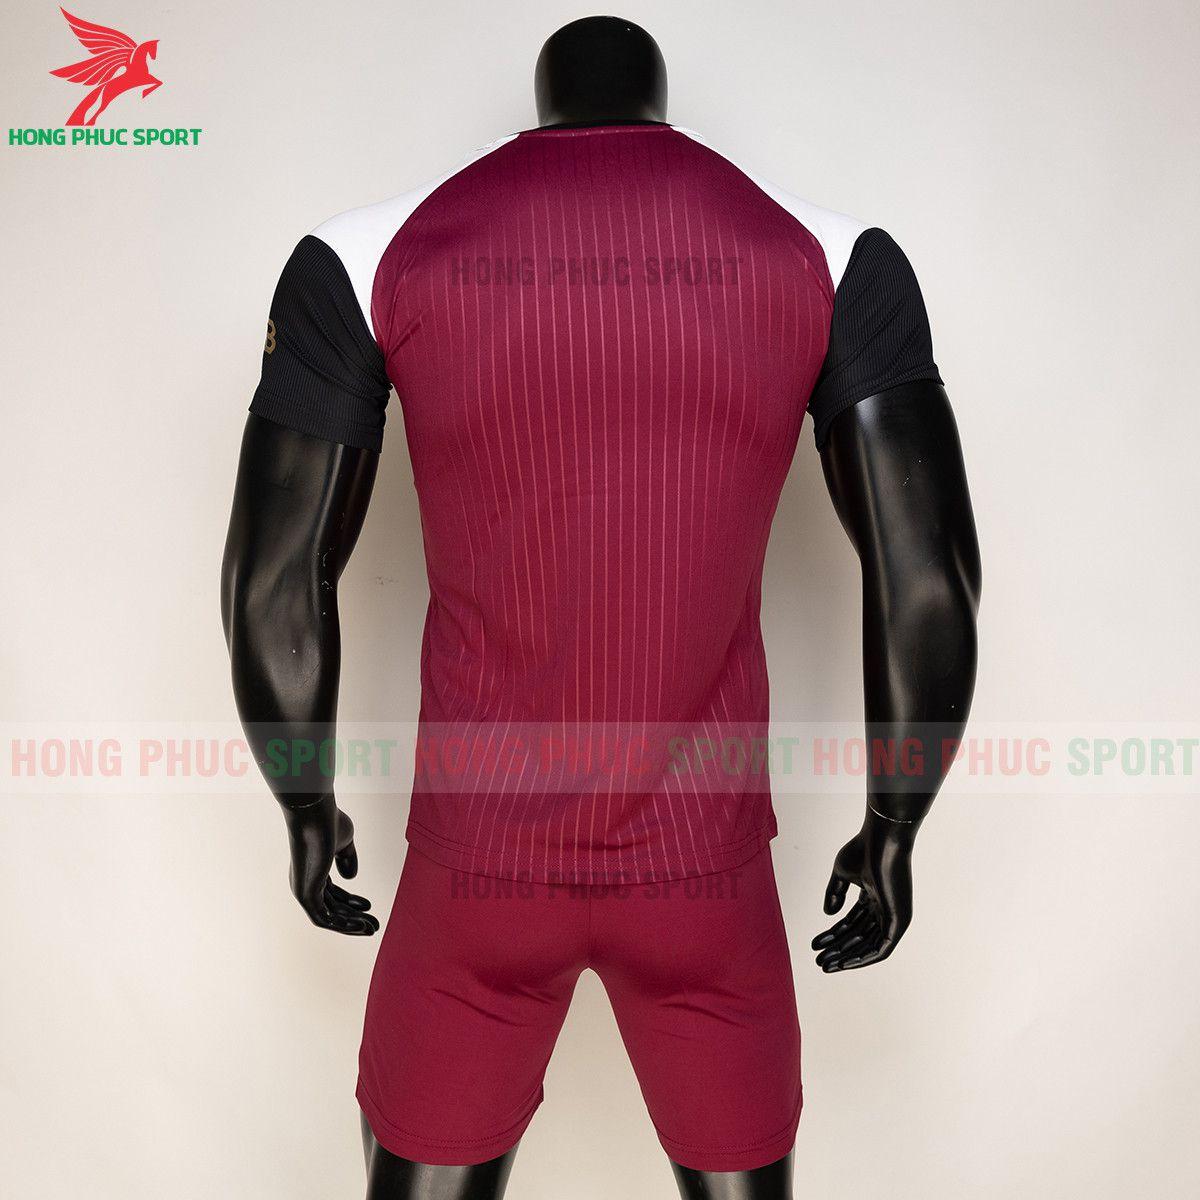 https://cdn.hongphucsport.com/unsafe/s4.shopbay.vn/files/285/ao-bong-da-psg-2020-21-mau-thu-3-thailand-61559799c421d.jpg